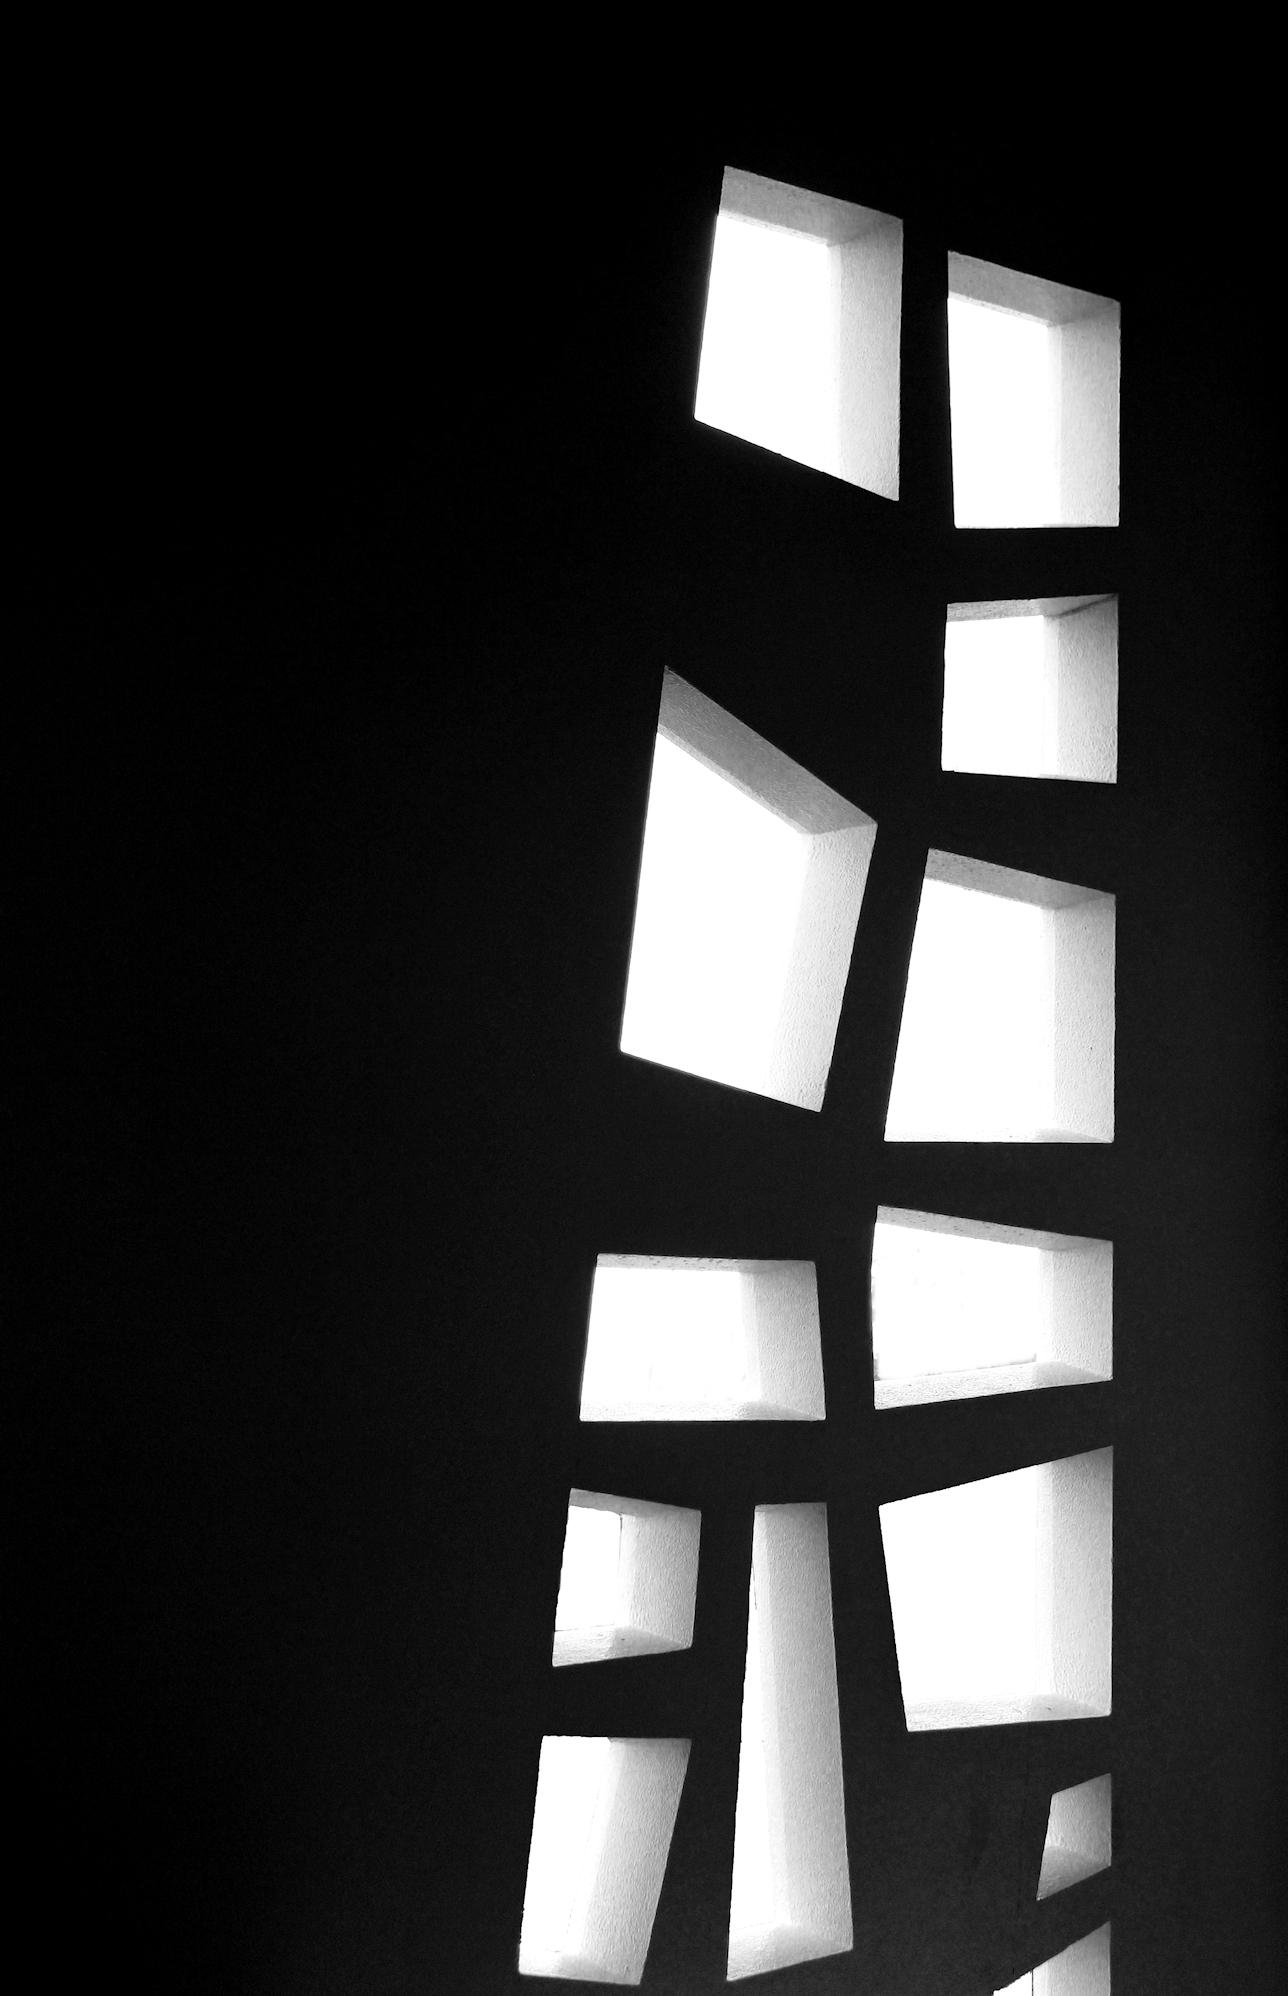 Brandi Foster - Tree Of LifePhotography20 x 30www.leauphotography.com